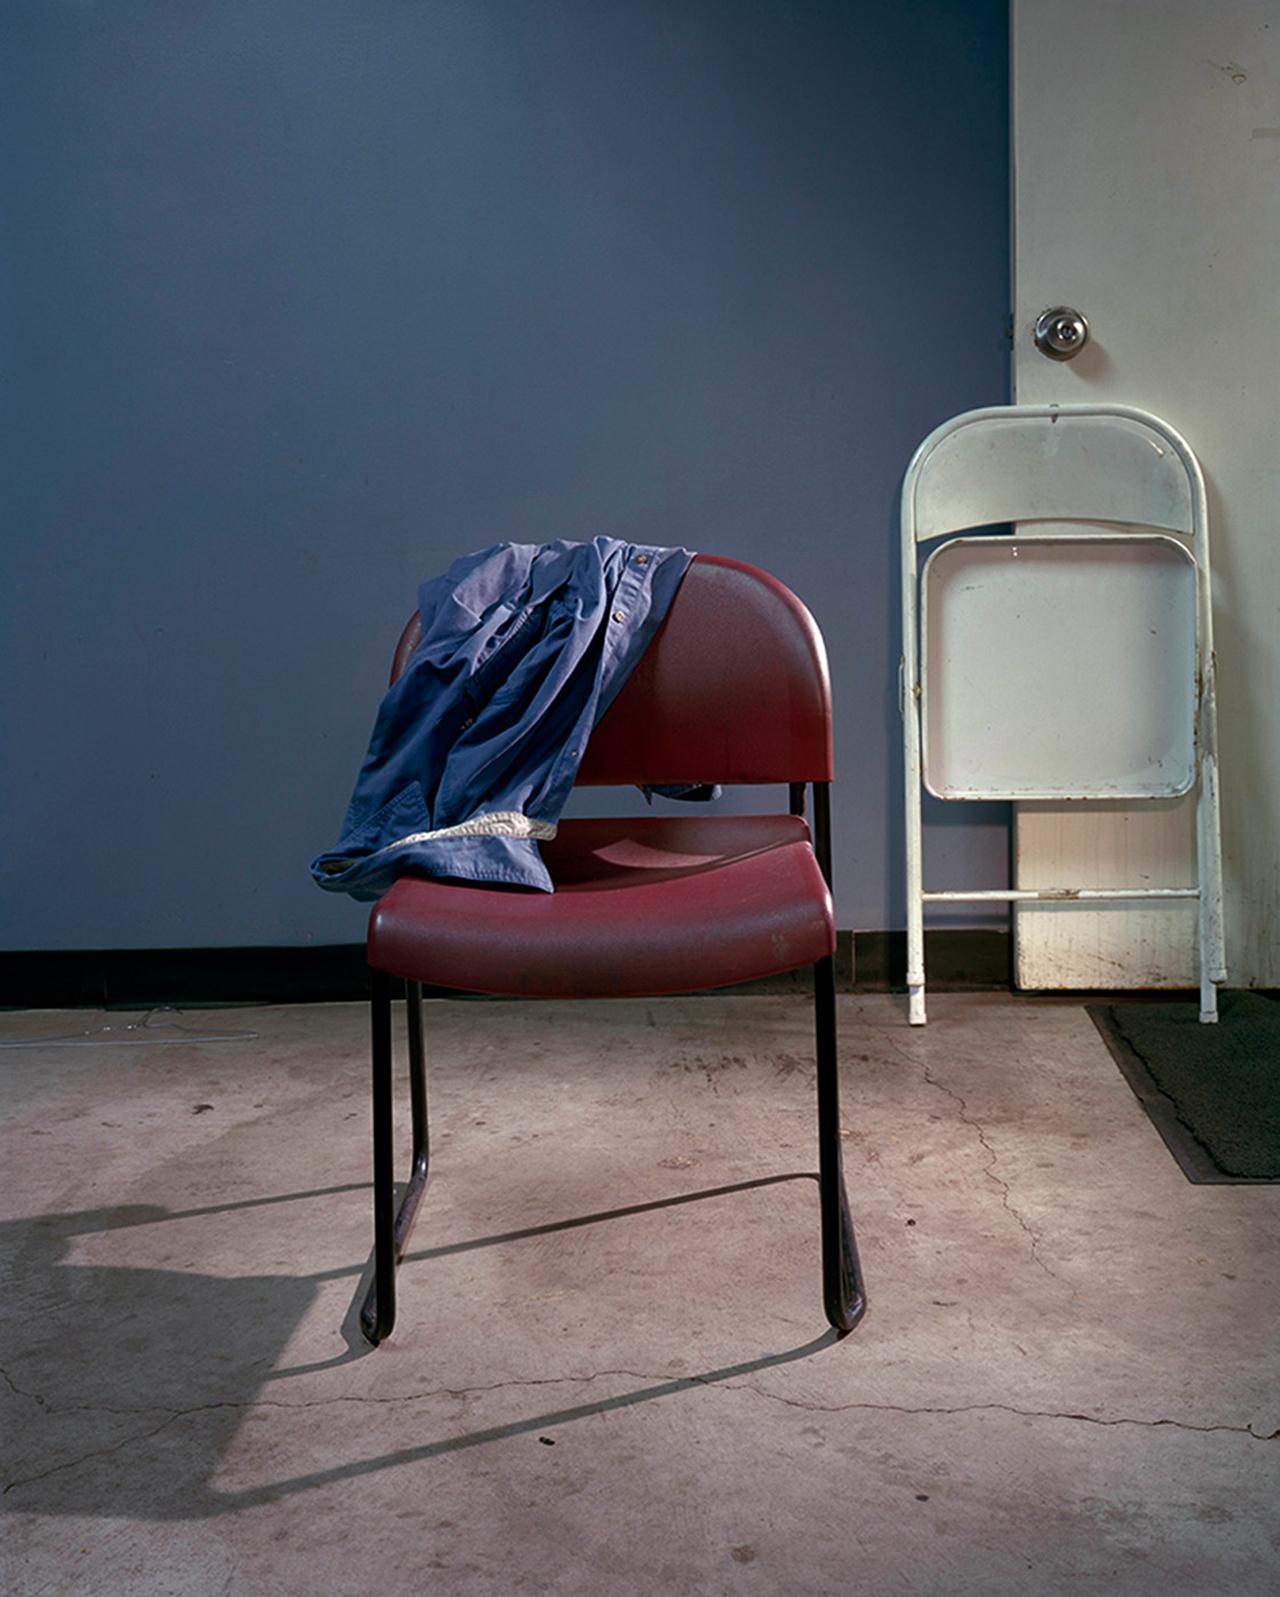 Chair, Chicago IL, 2013 ©Juan Giraldo